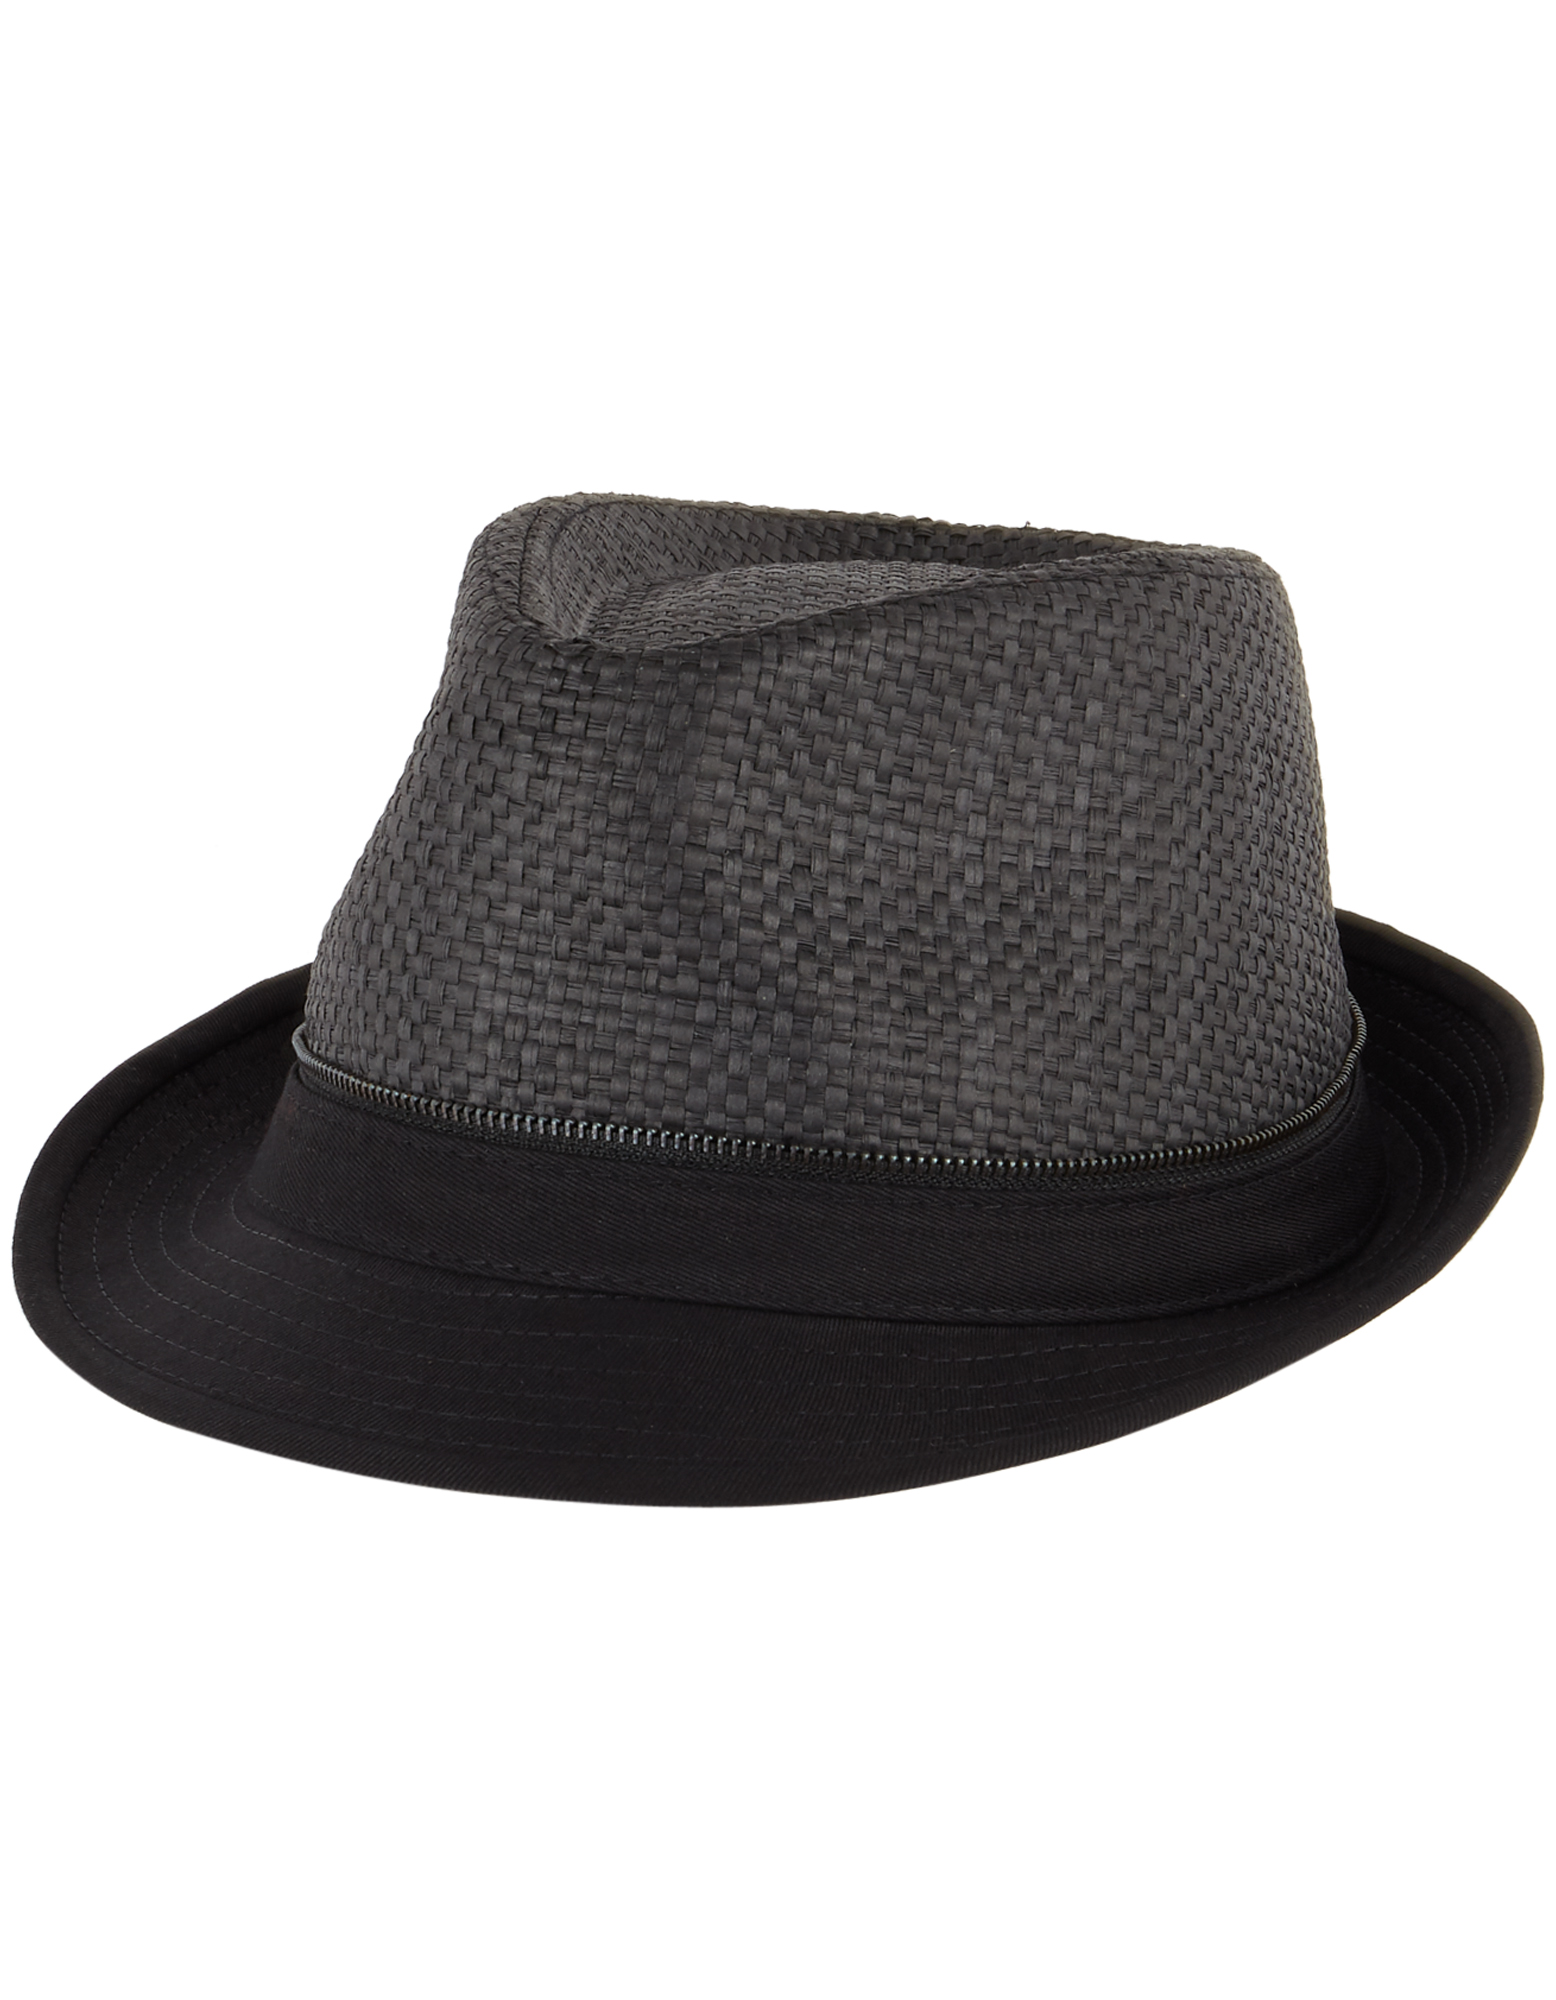 Herren Trilby mit Kontrastbesatz | Accessoires > Hüte > Trilbys | Takko